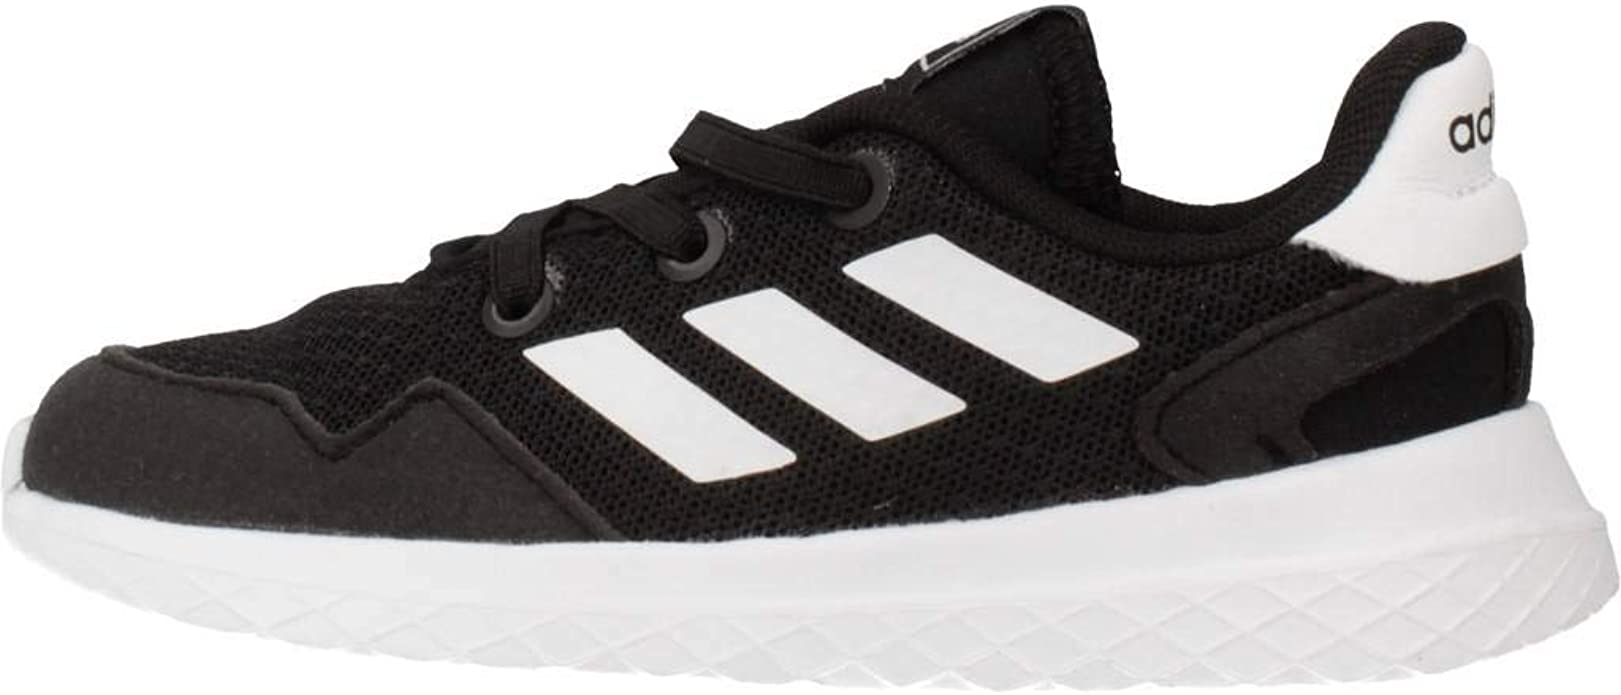 adidas Archivo Infant Toddler Kids Sports Trainer Shoe Black/White - UK